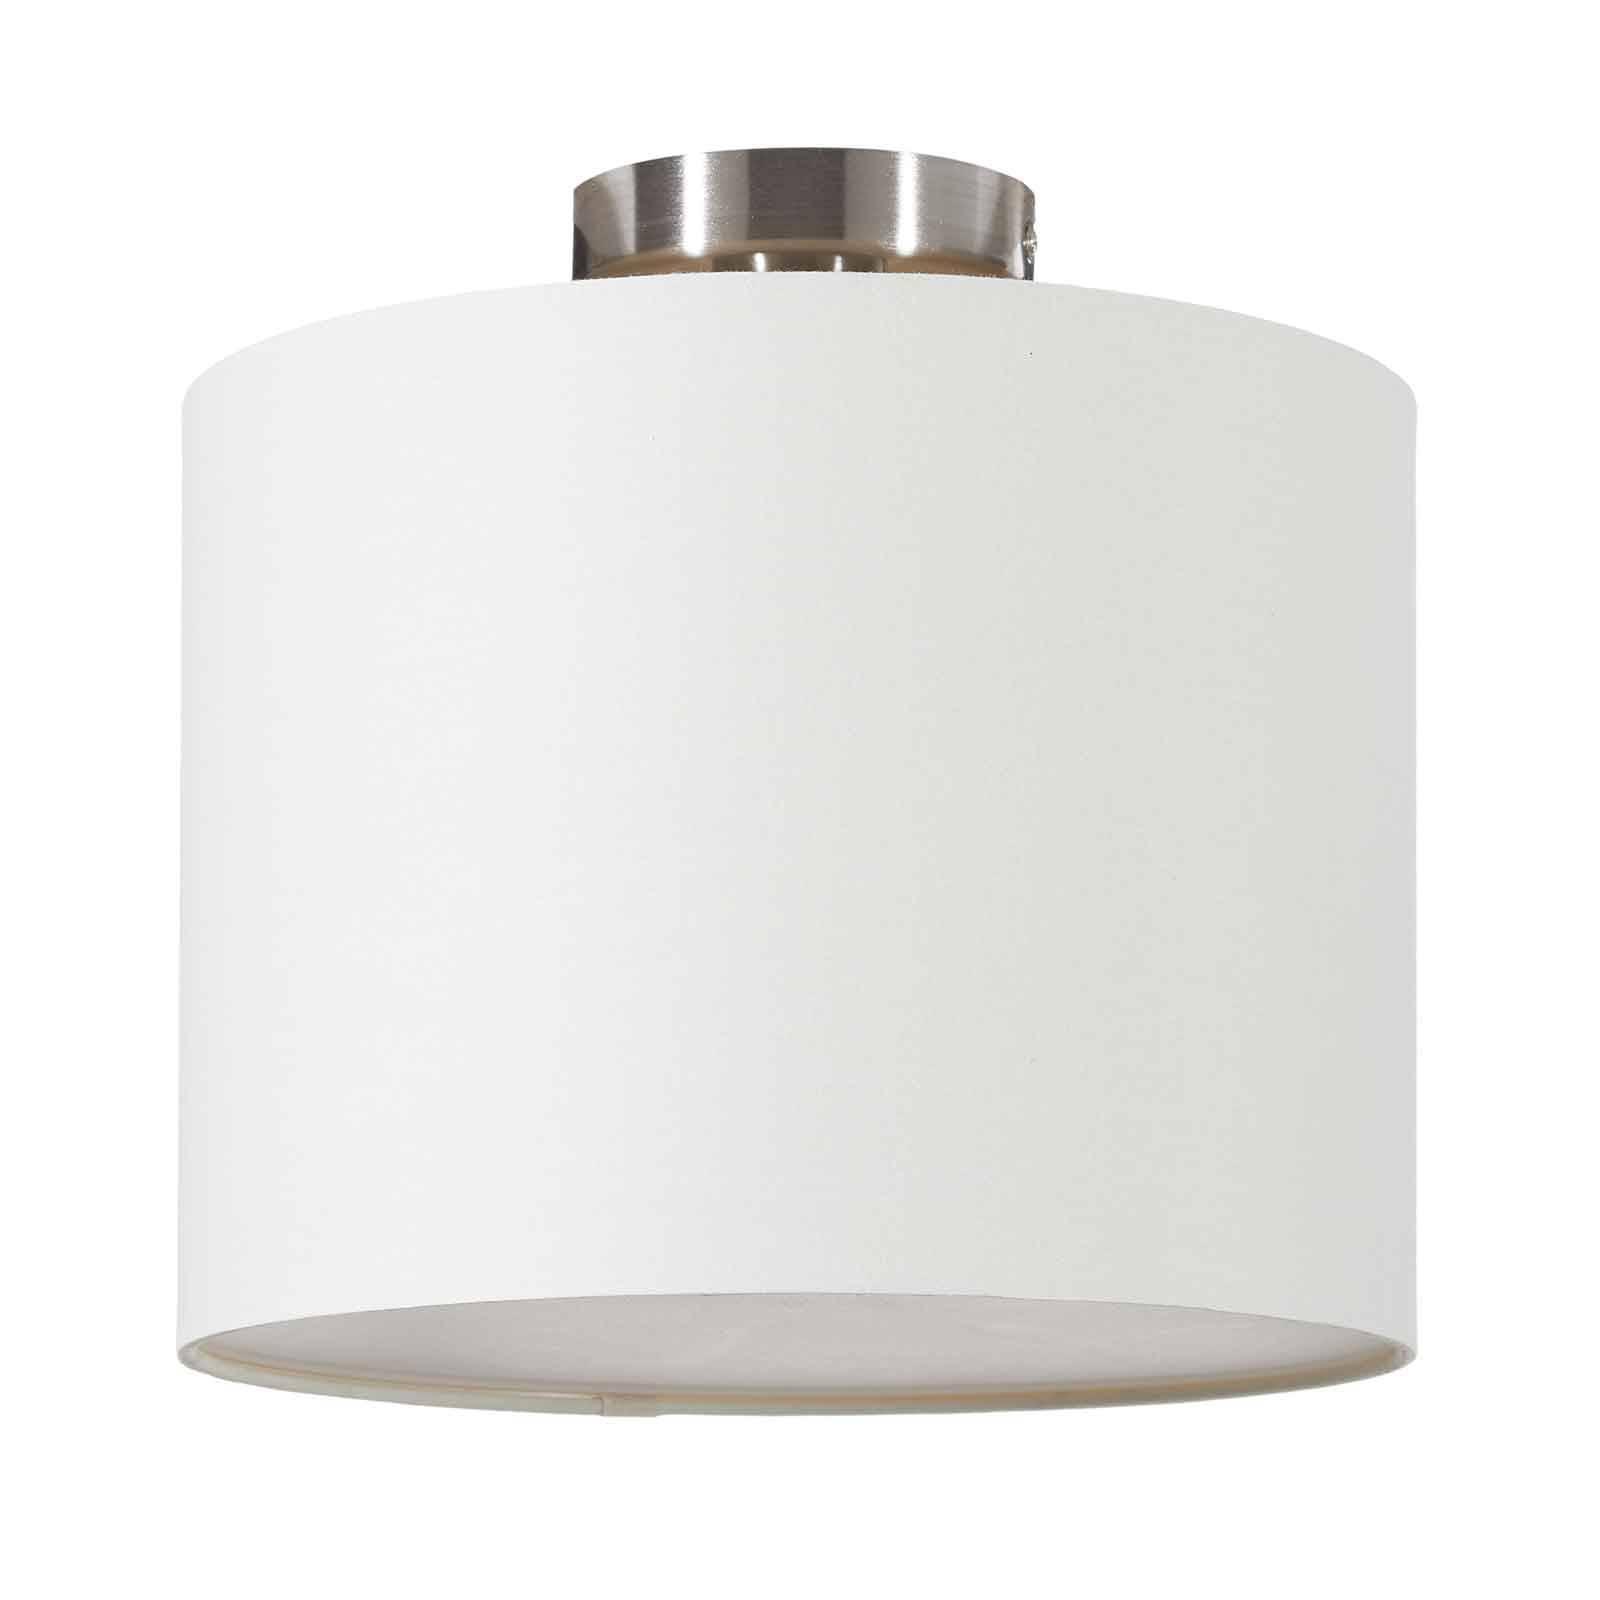 Lucande Patrik lampa sufitowa Ø30cm kremowa